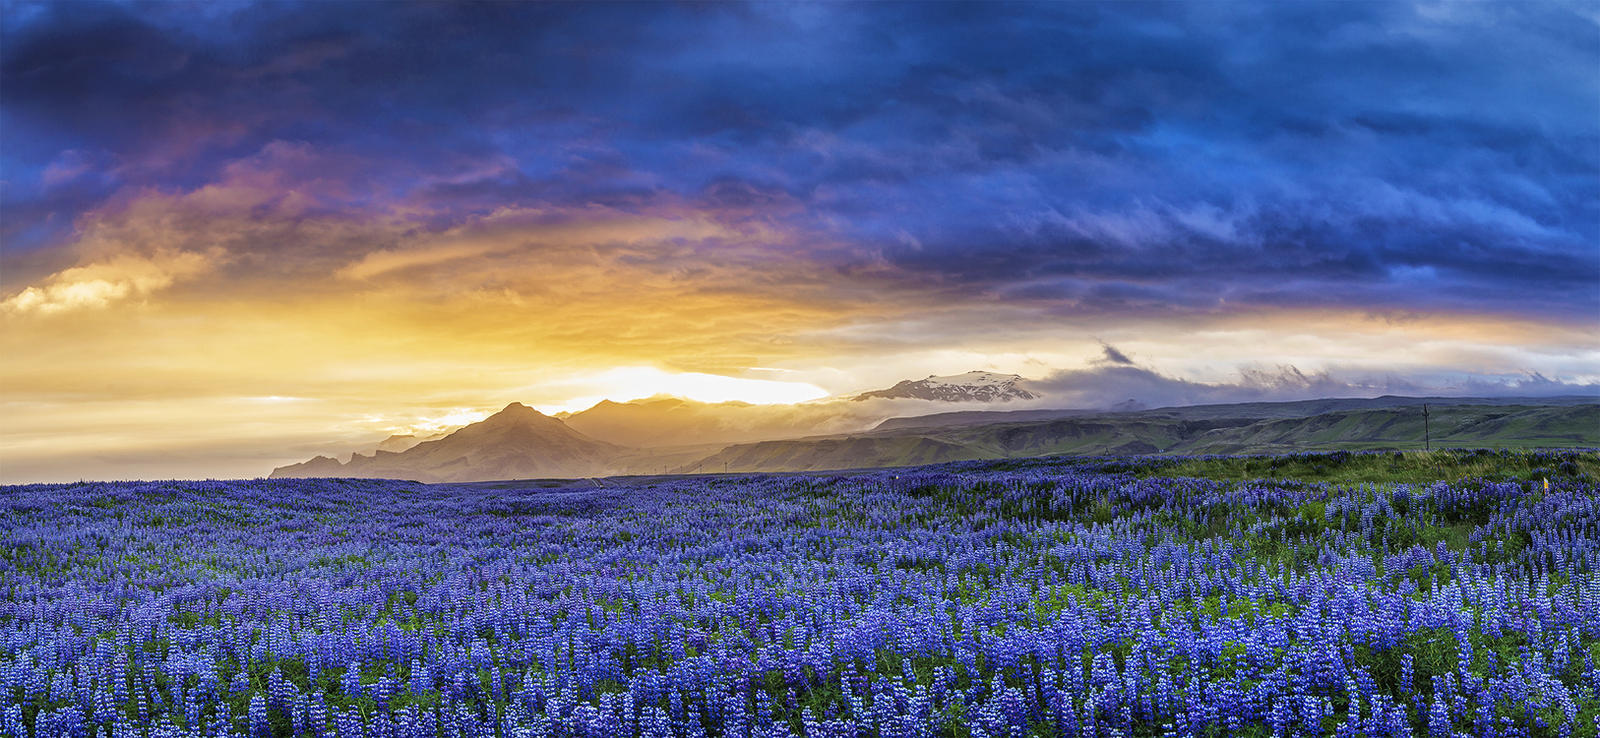 Midsummer Night on Iceland 2016 by PatiMakowska